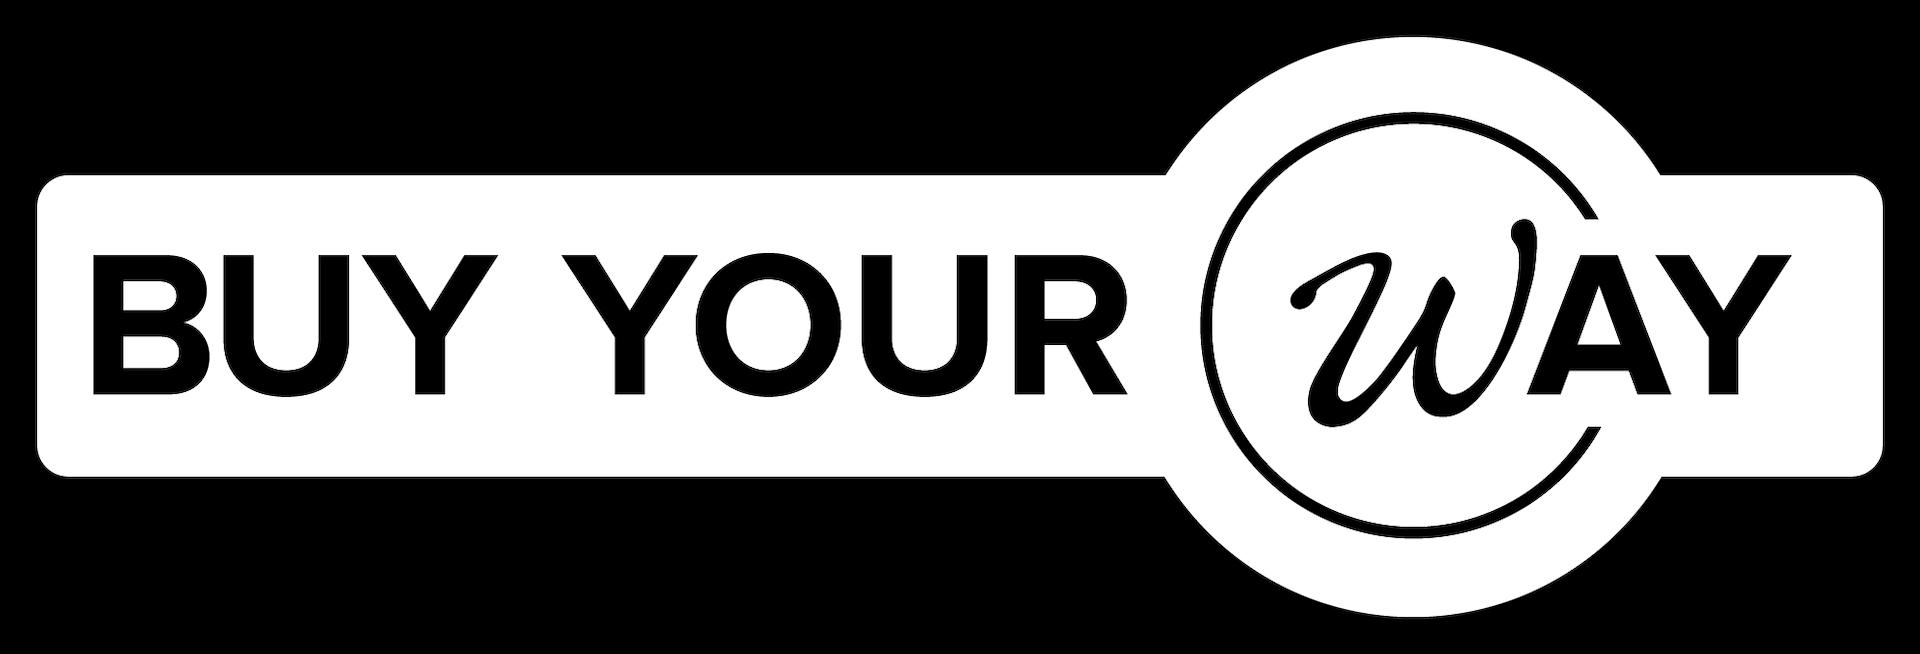 buyYourway logo